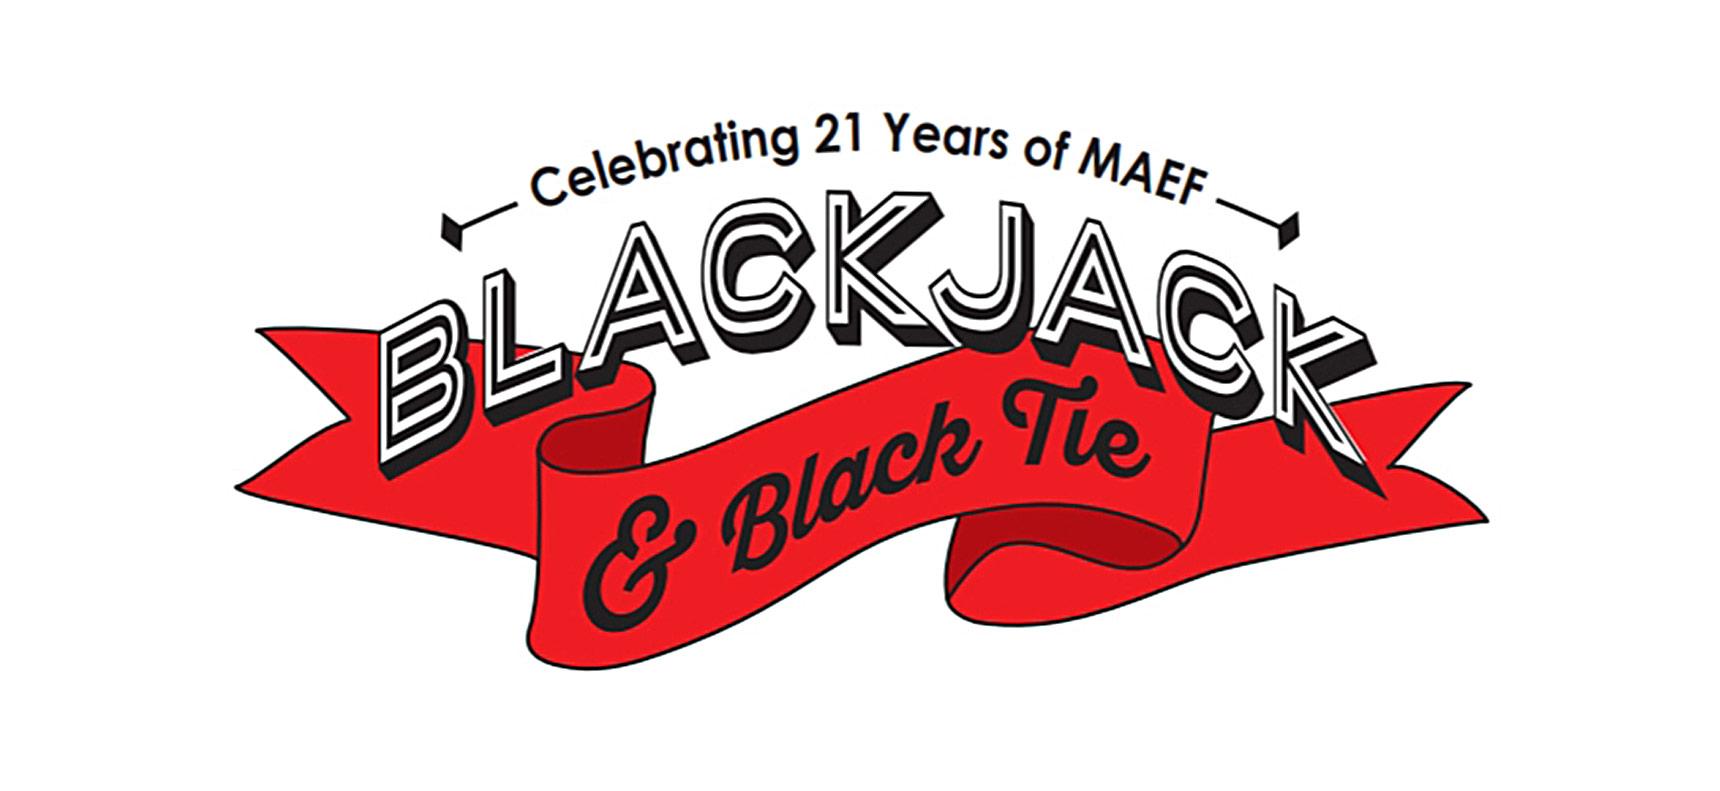 Blackjack & Black Tie